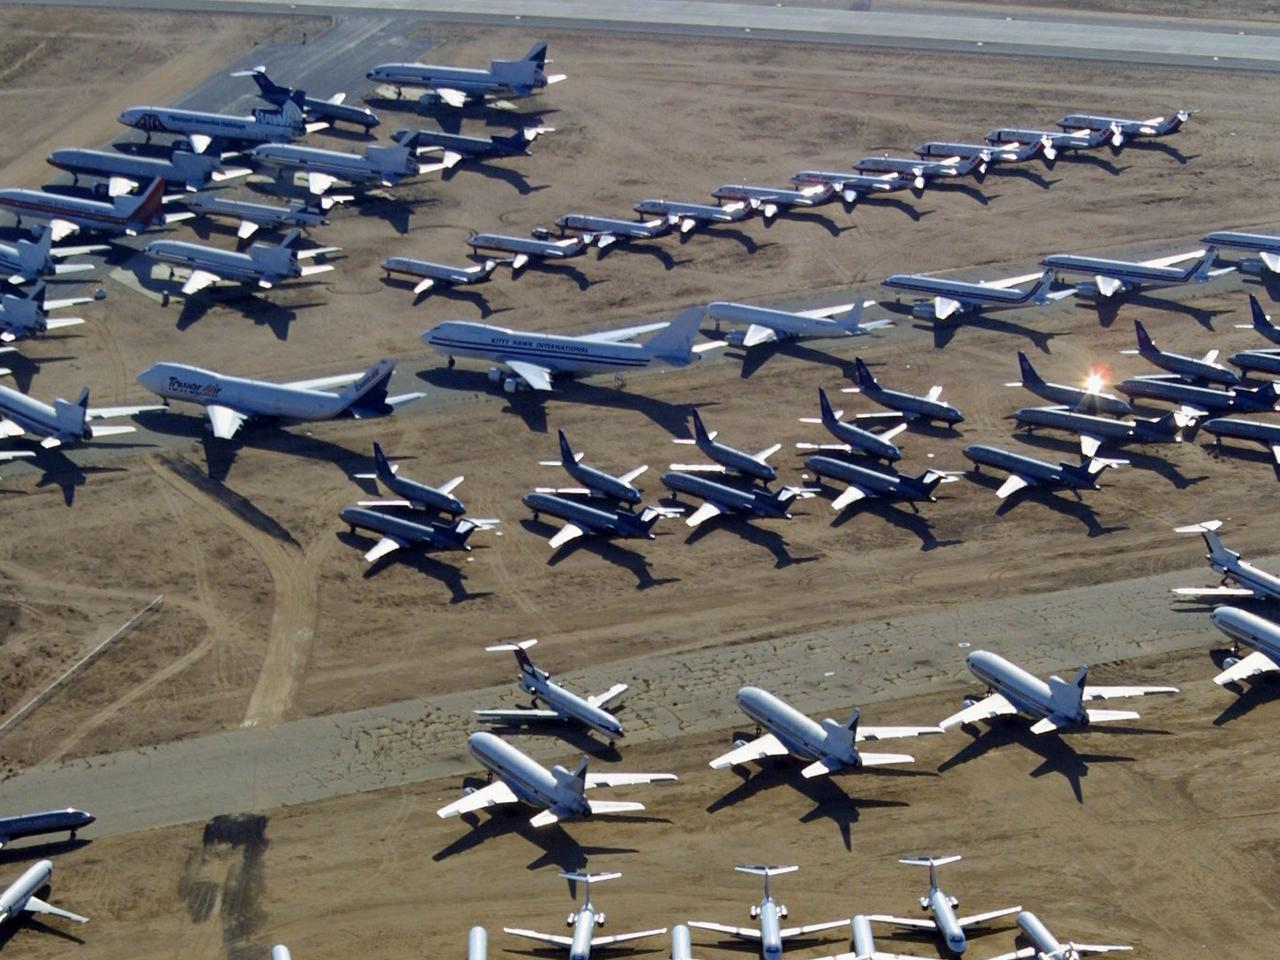 Airplane Graveyard in California